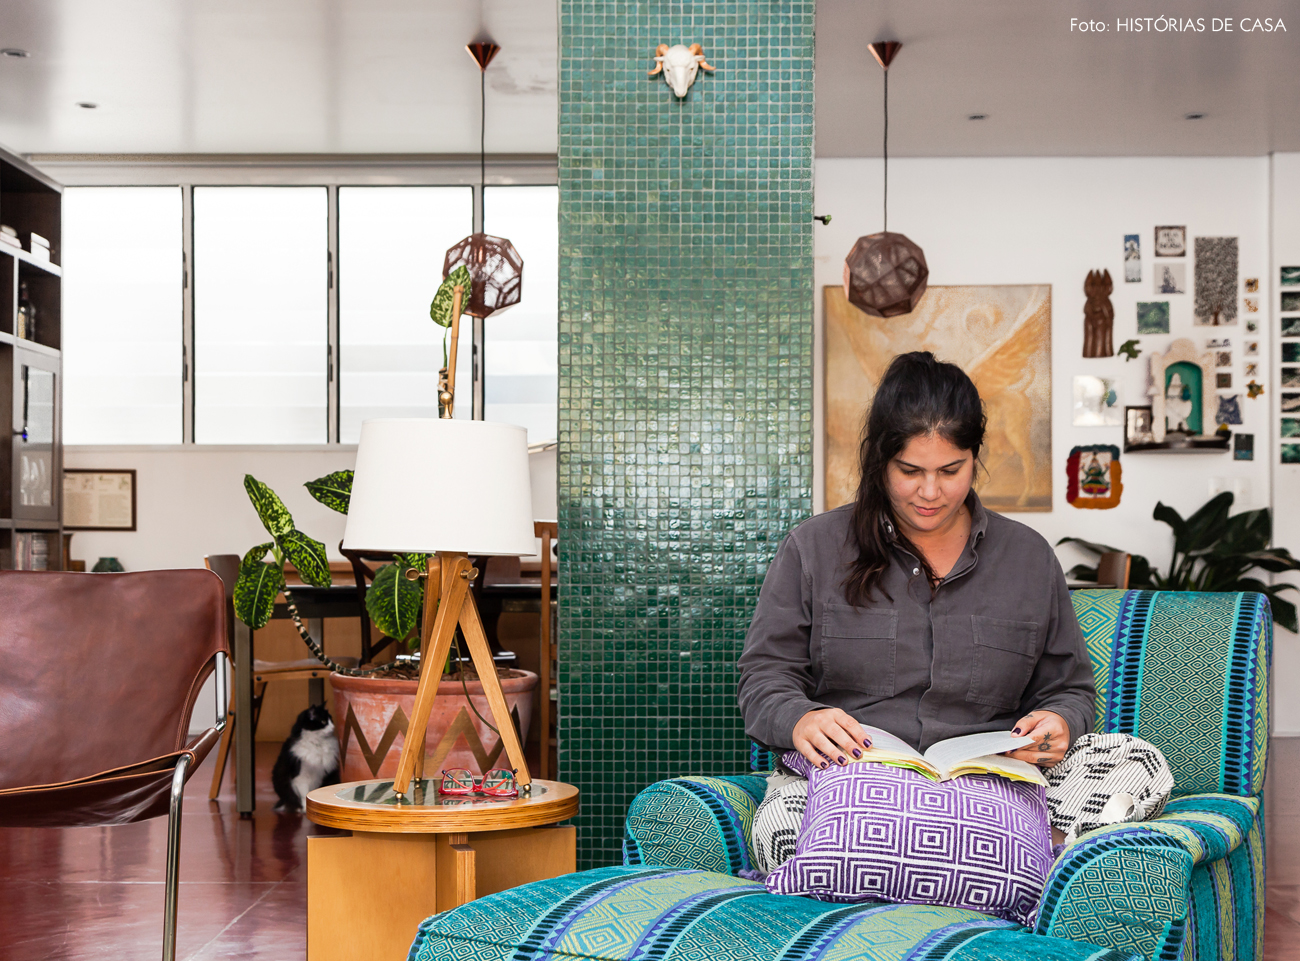 16-decoracao-apartamento-escritora-roberta-ferraz-retrato